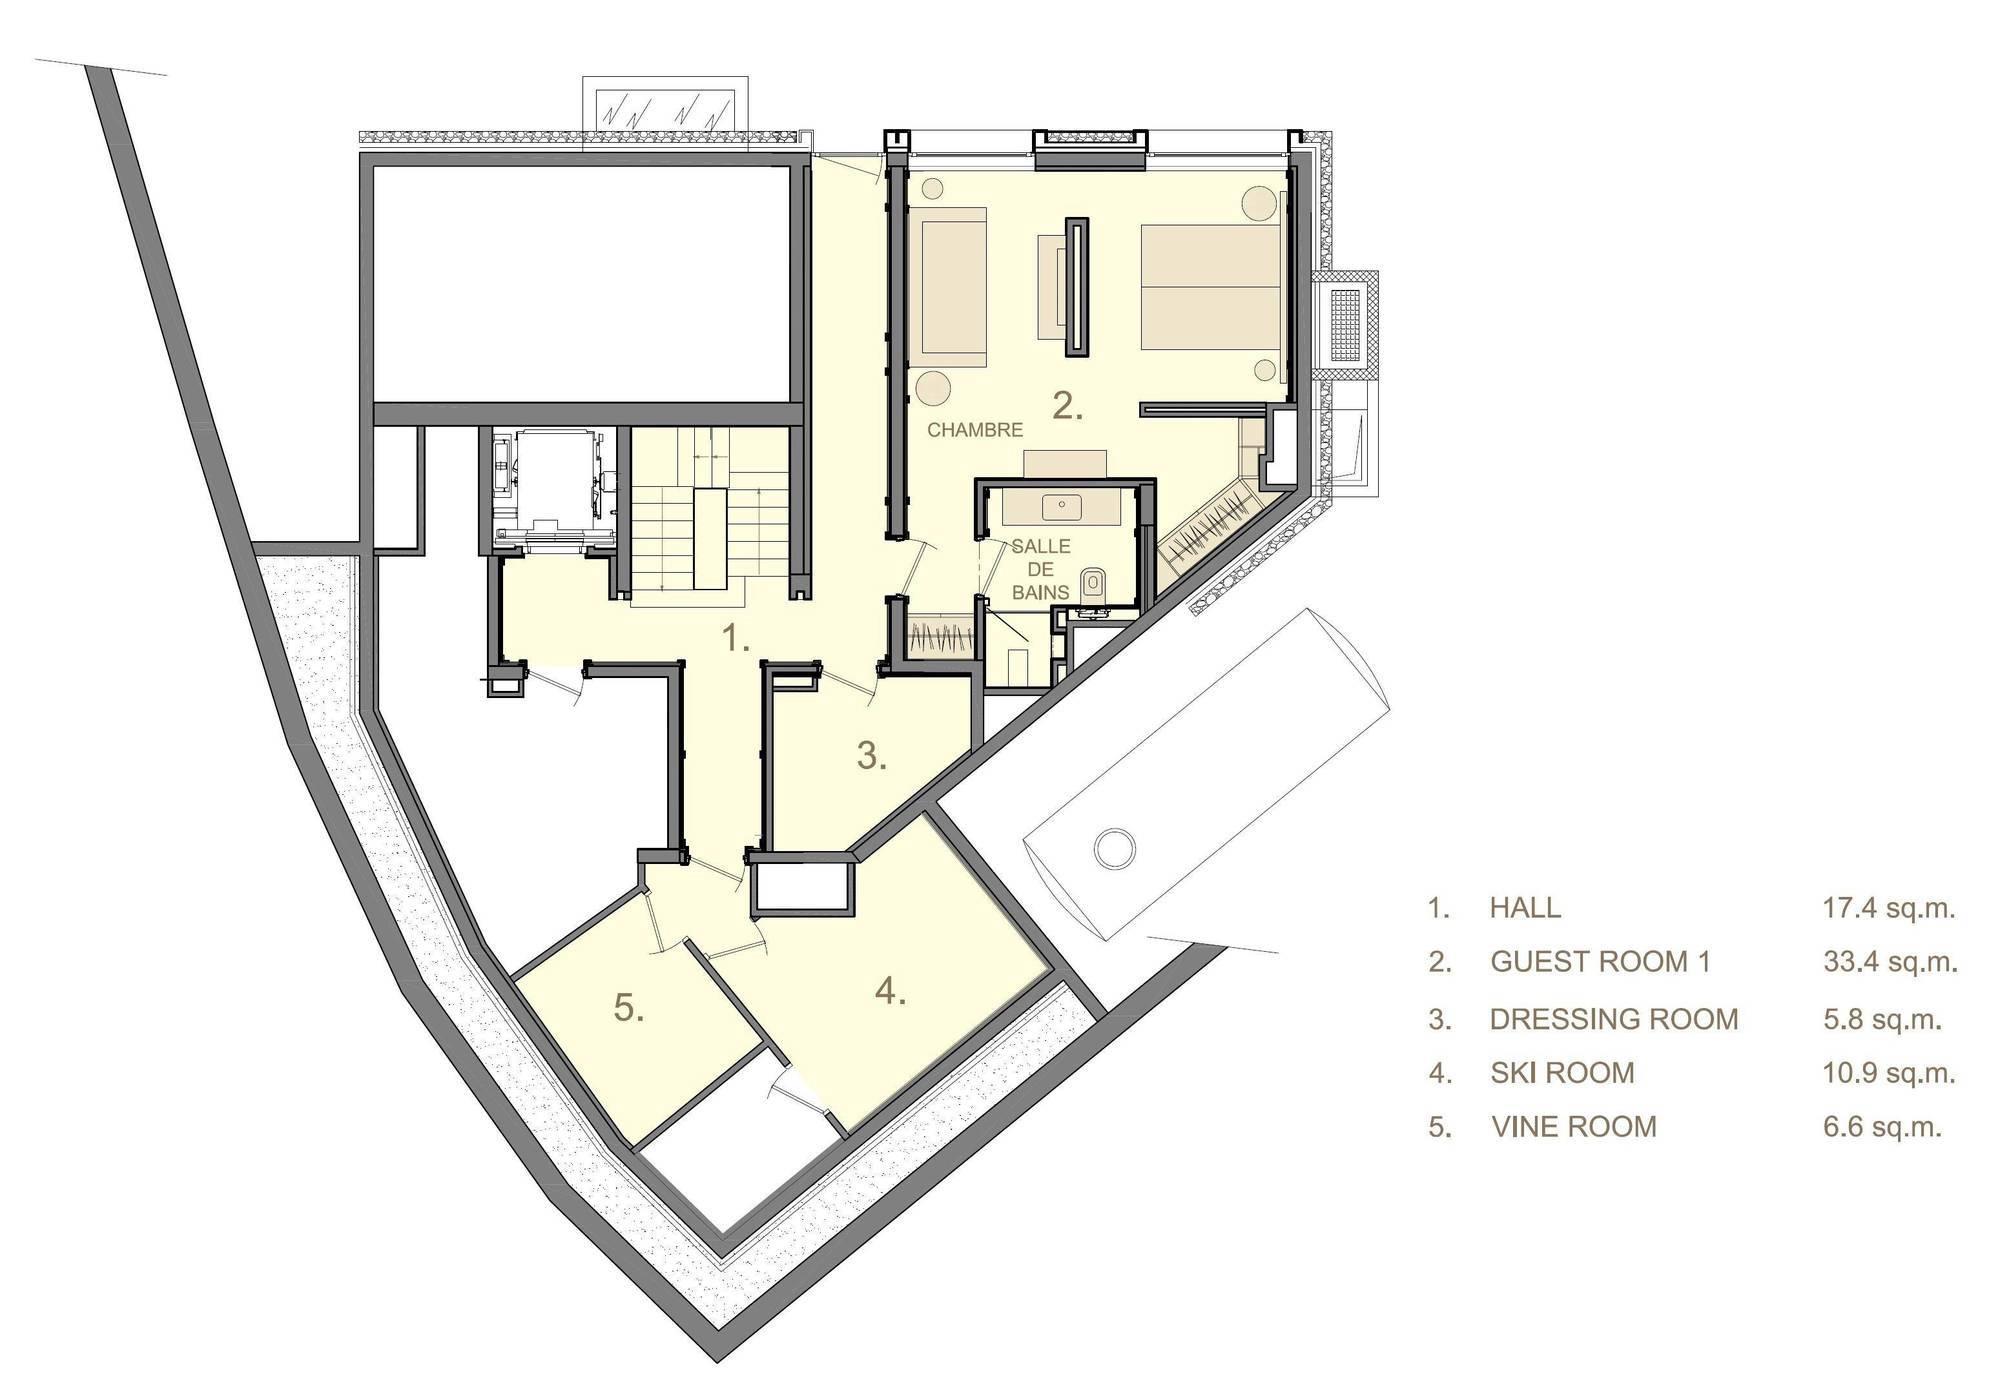 Chalet La Datcha Courchevel Floor Plan 4